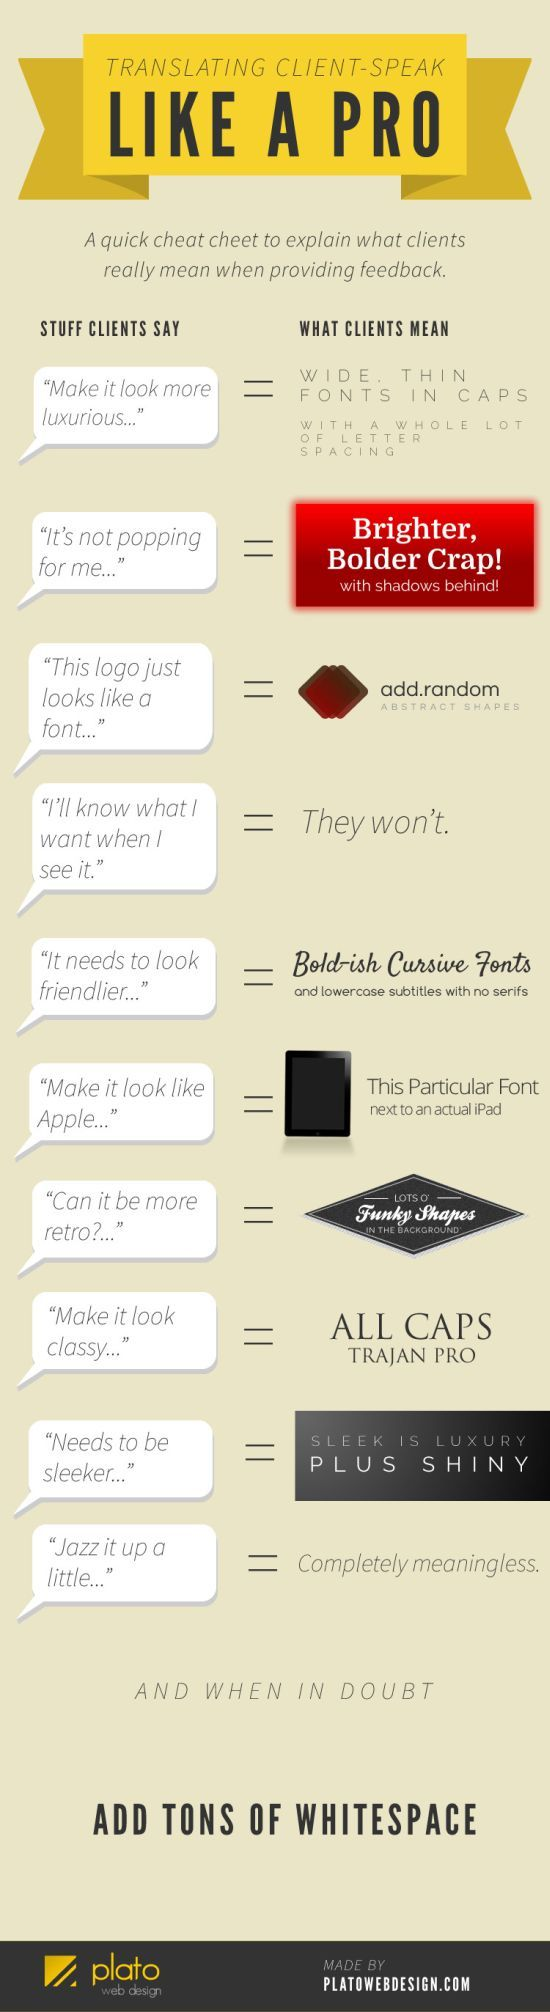 Webdesigner - translating client-speak LIKE A PRO #infographic